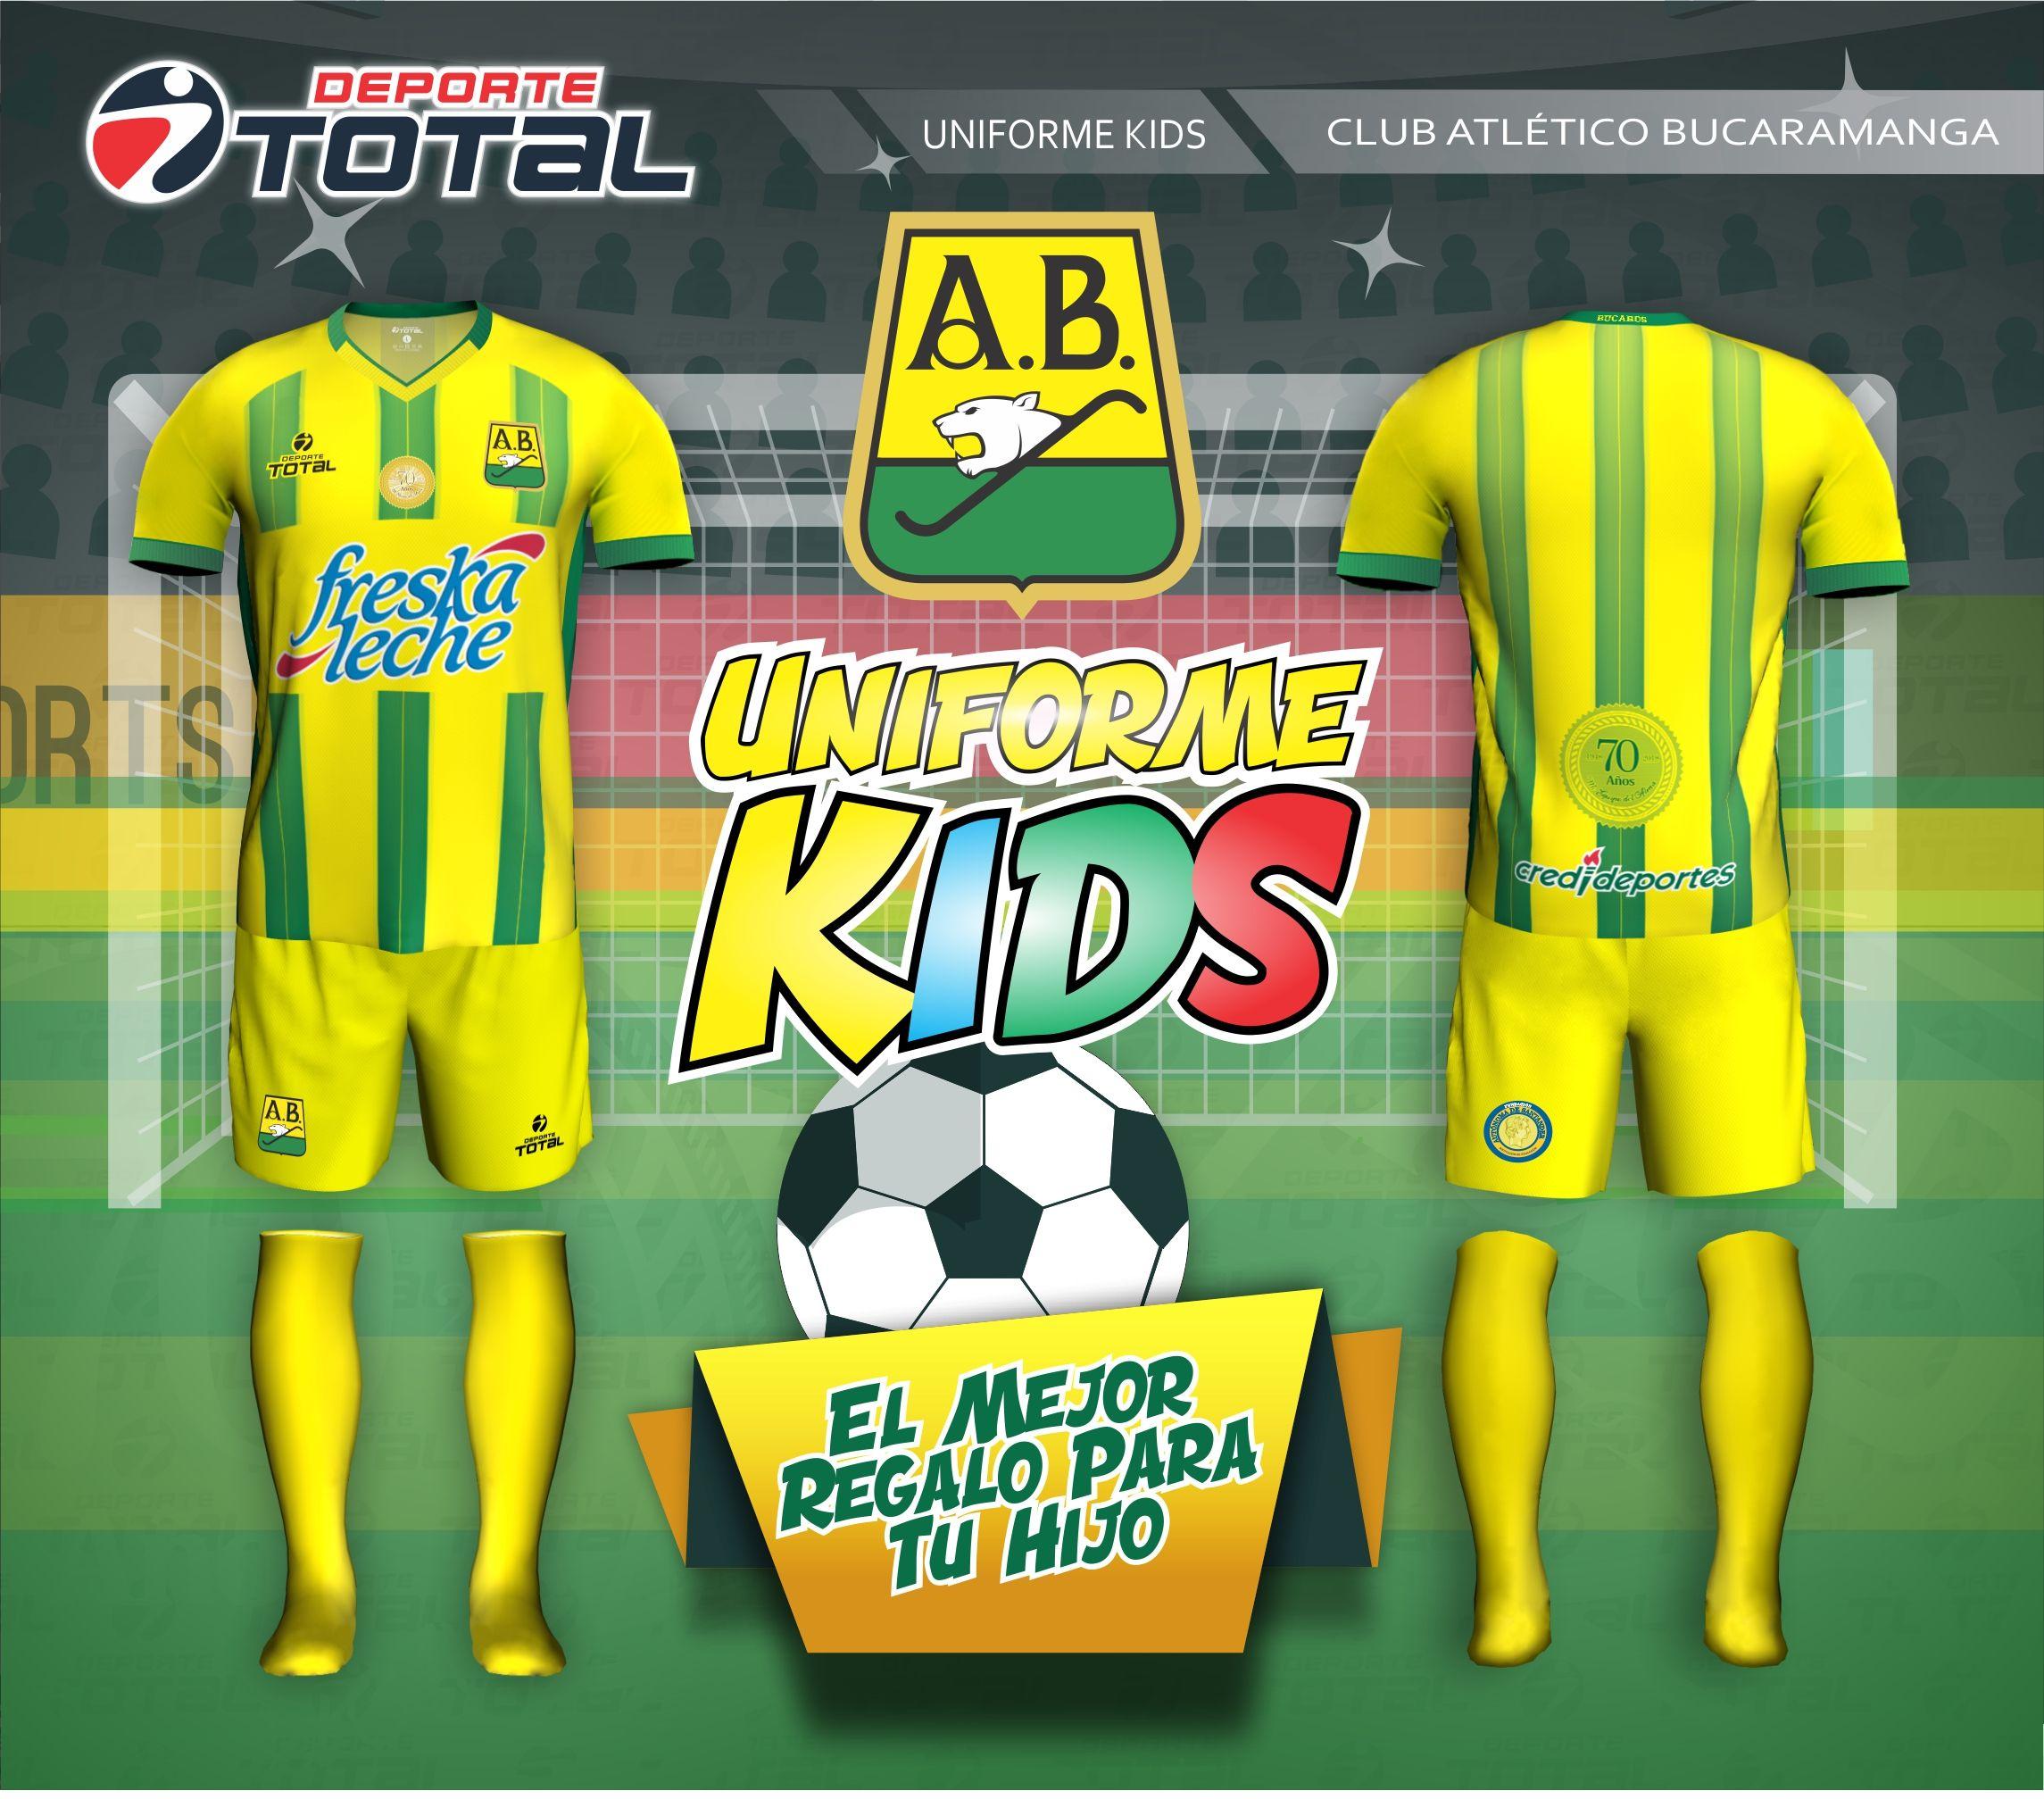 Uniforme de Niños - deporte total-atletico bucaramanga- 2018-camiseta- uniforme- cec5b38c926b2